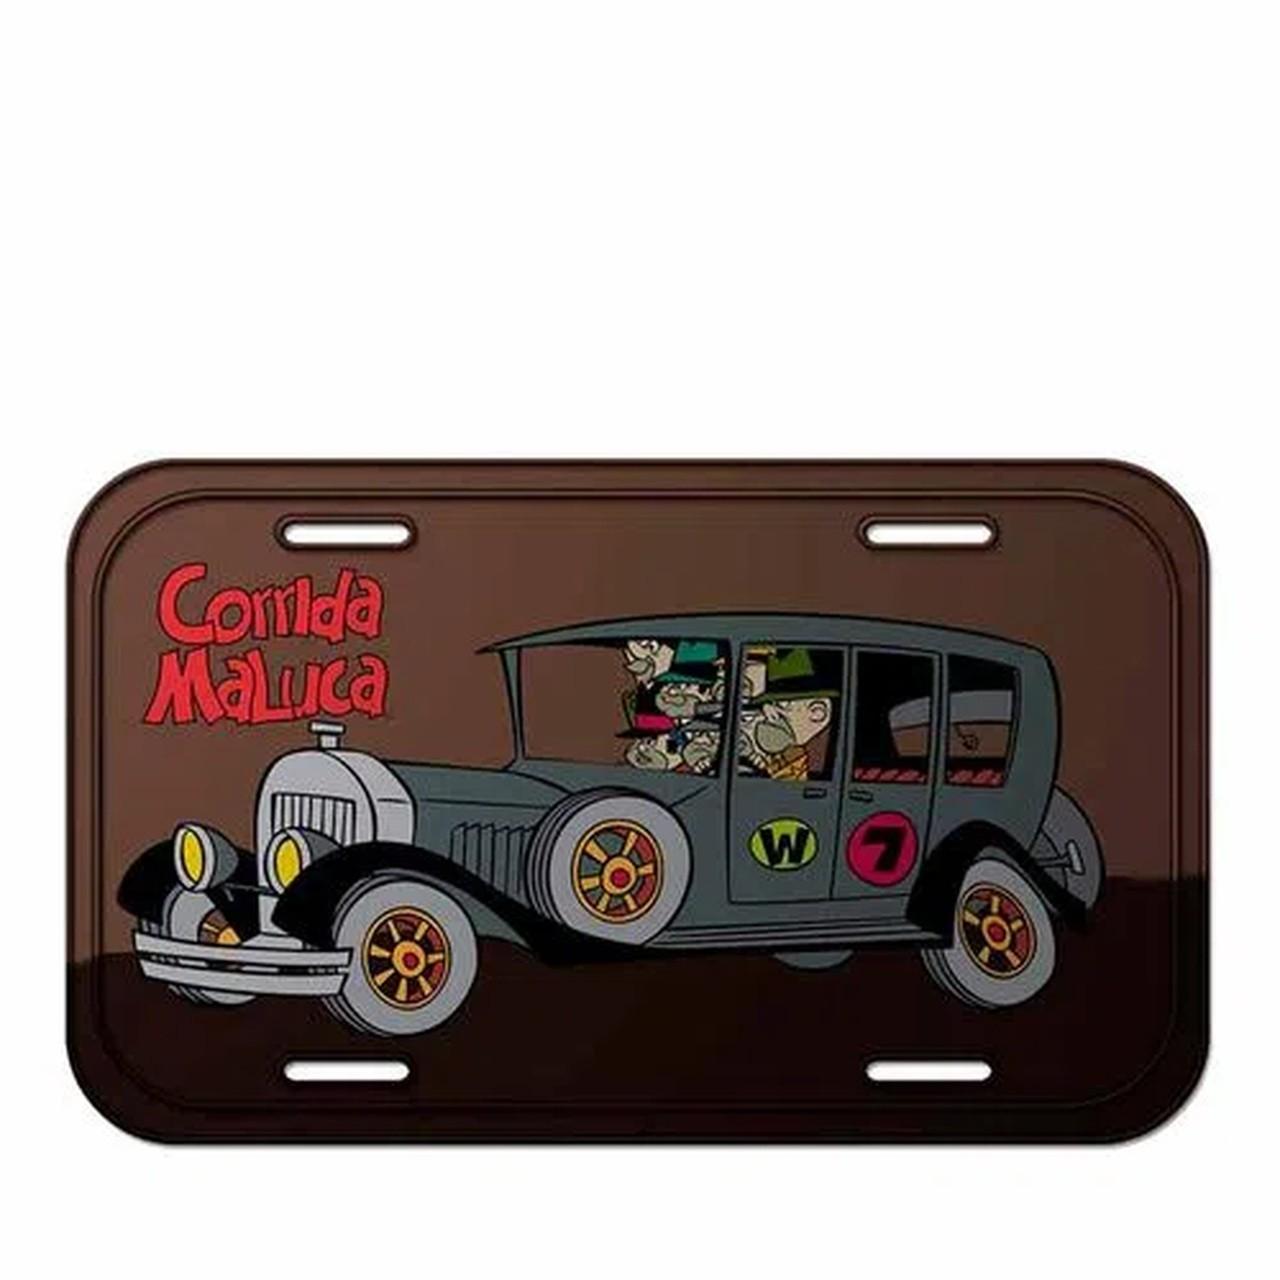 Placa De carro Quadrilha da Morte: Corrida Maluca  - Metropole